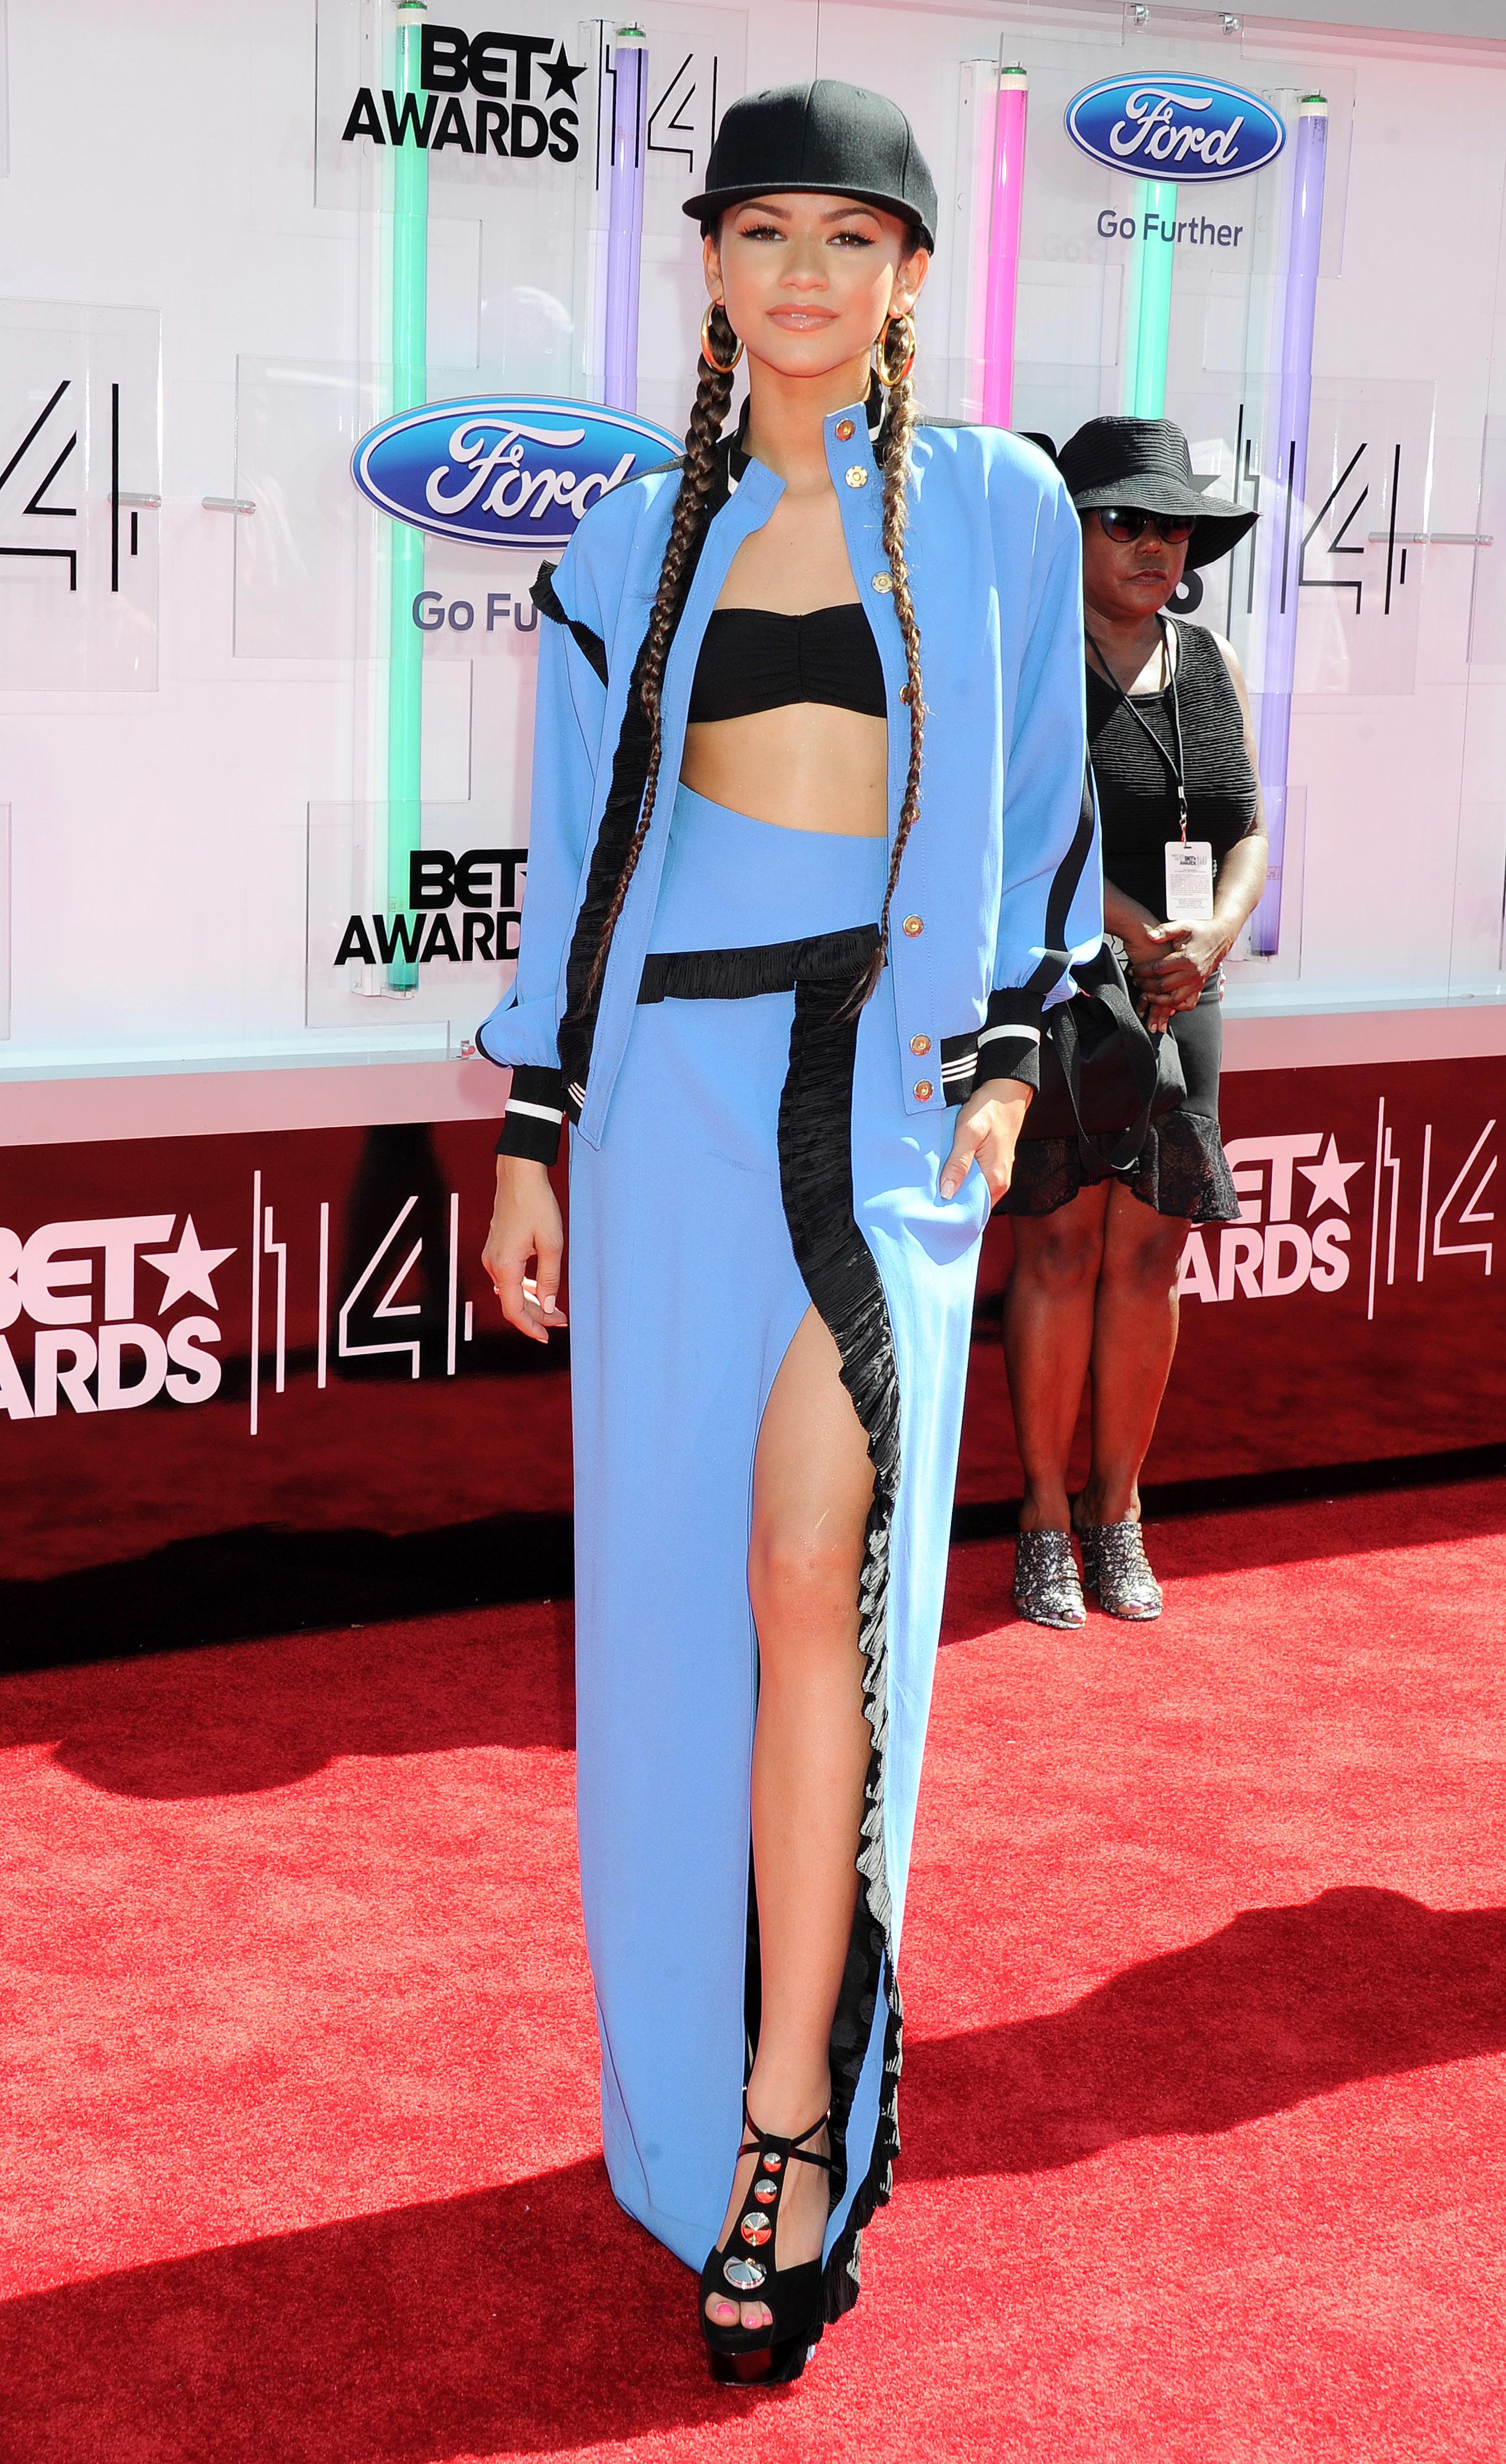 Zendaya Most Memorable Bet Awards Fashion Moments